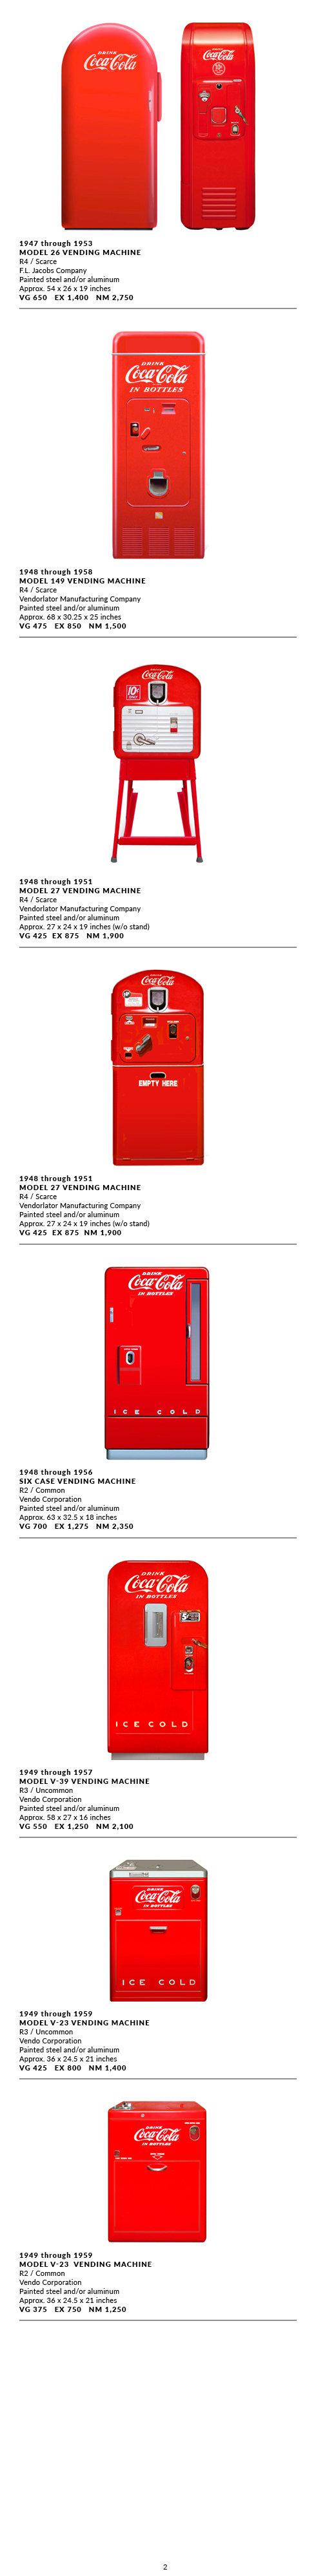 Vending Machines2.jpg